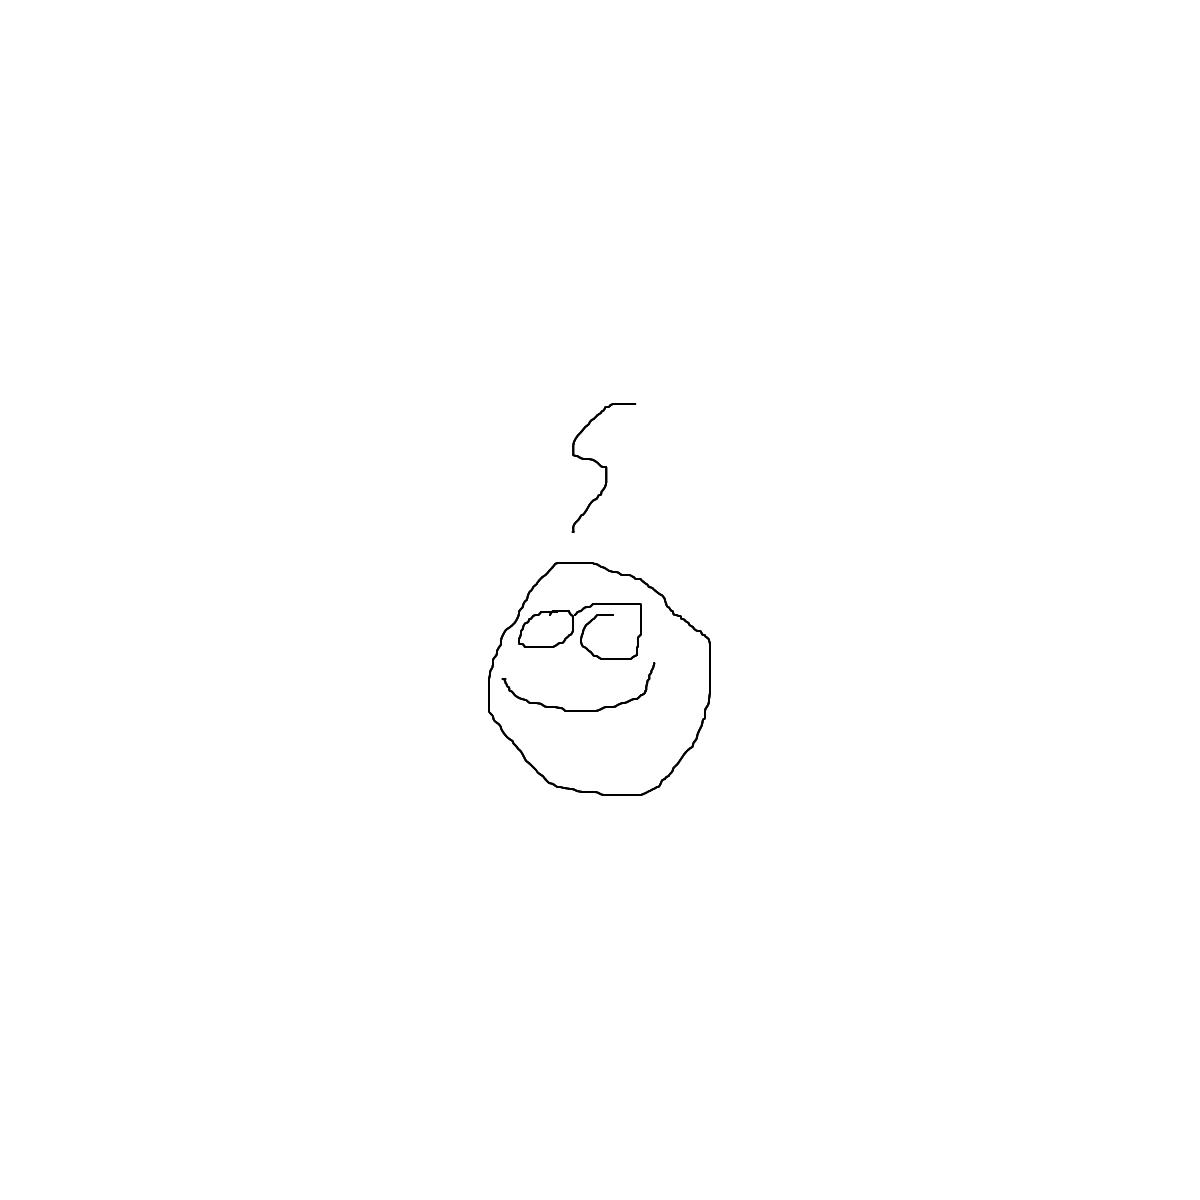 BAAAM drawing#23207 lat:78.4204483032226600lng: -4.4849948883056640